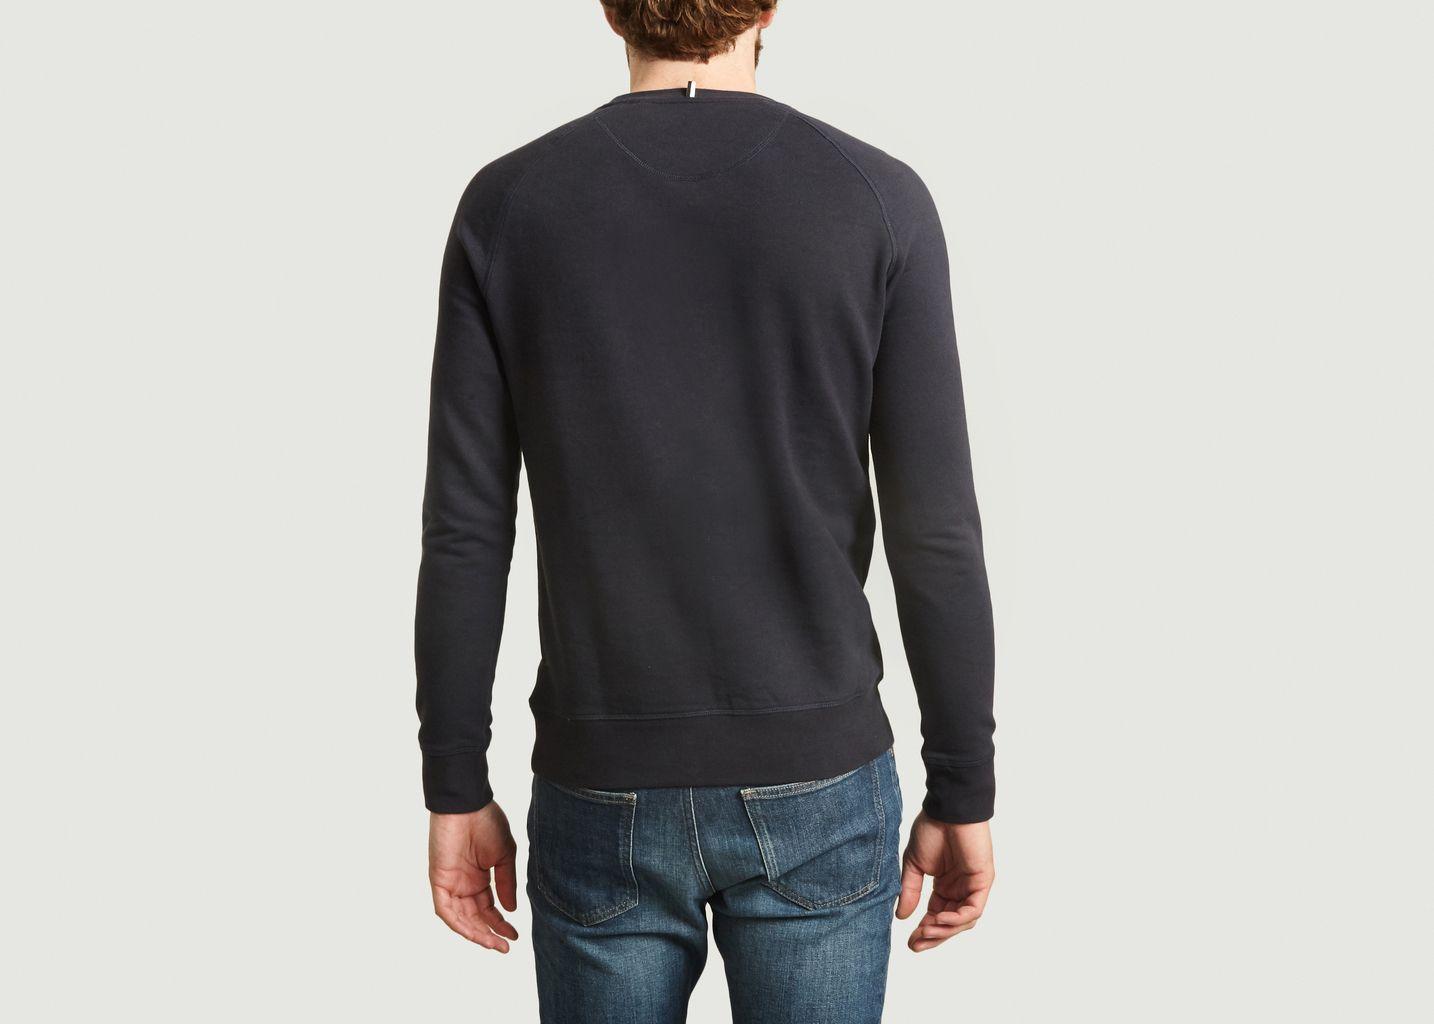 Sweatshirt Darney The Wild - Faguo